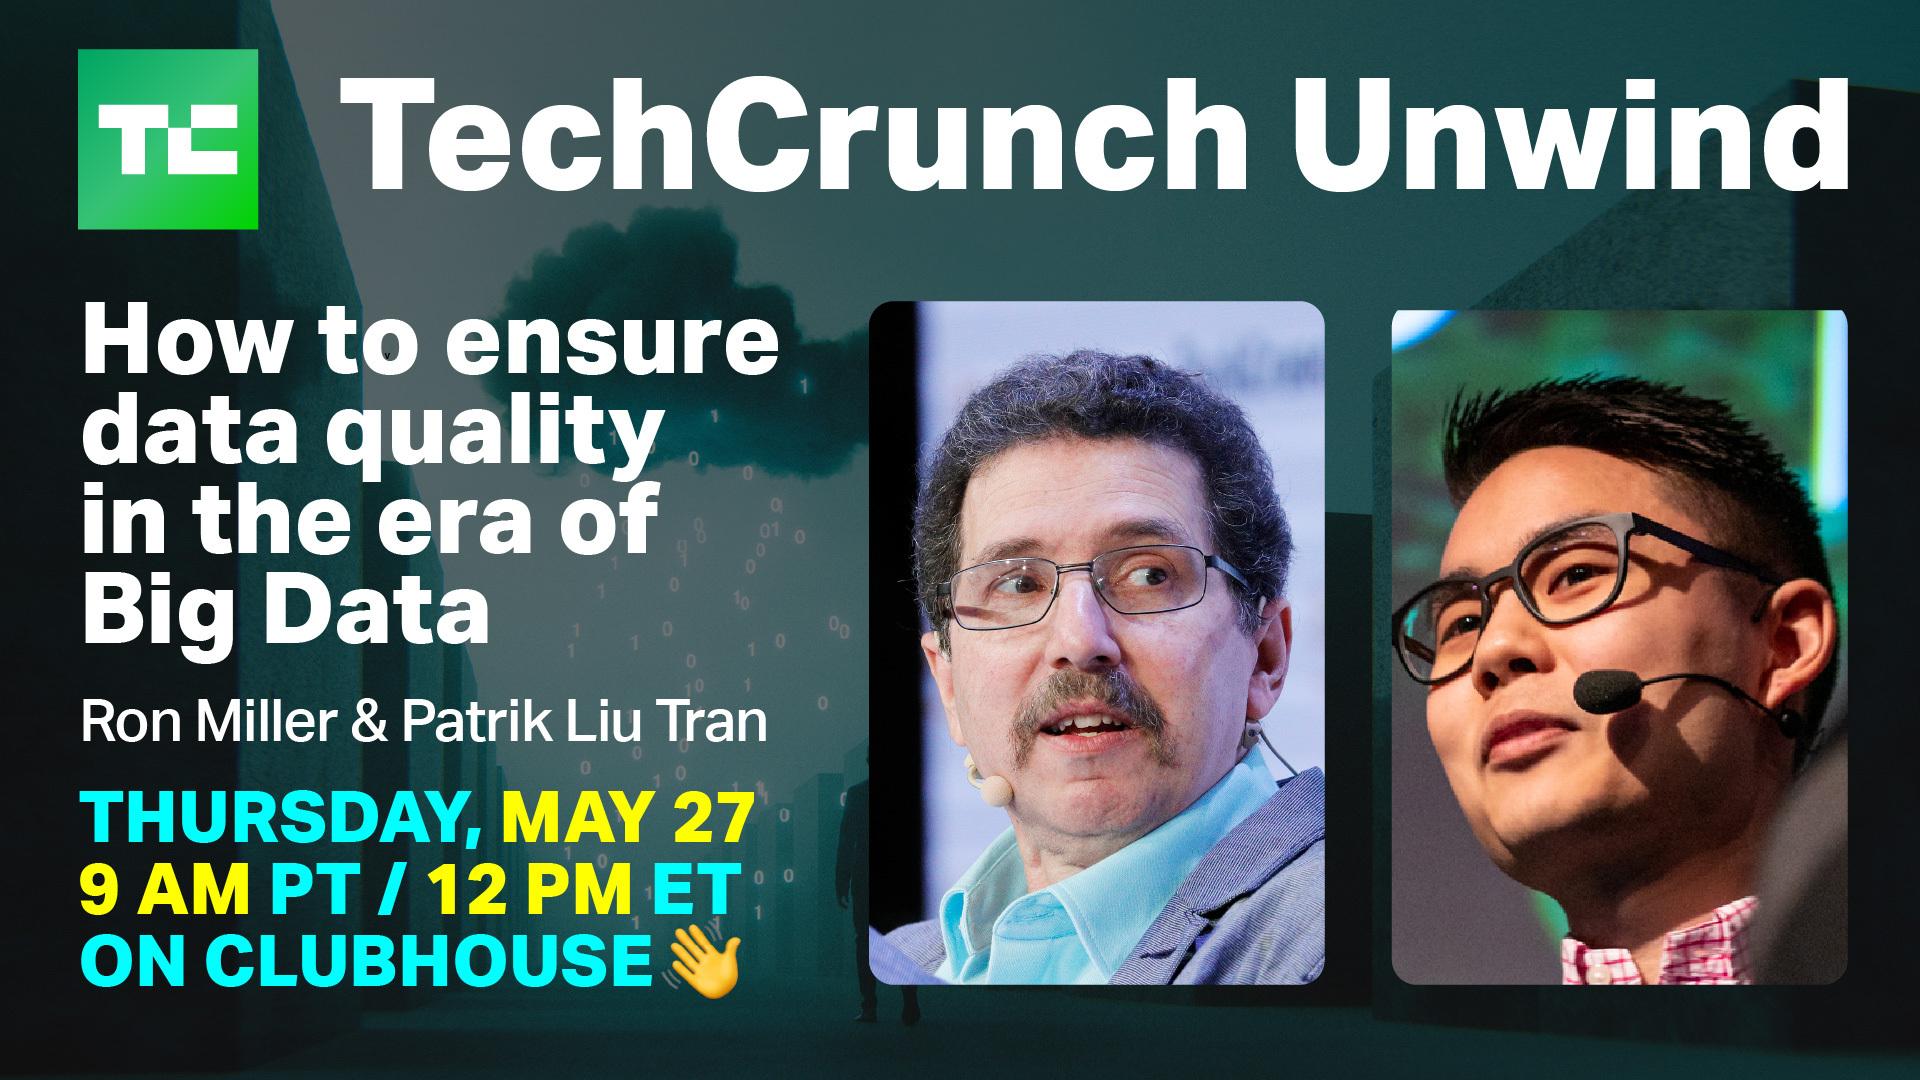 TC unwind chat with Ron Miller and Patrik Liu Tran